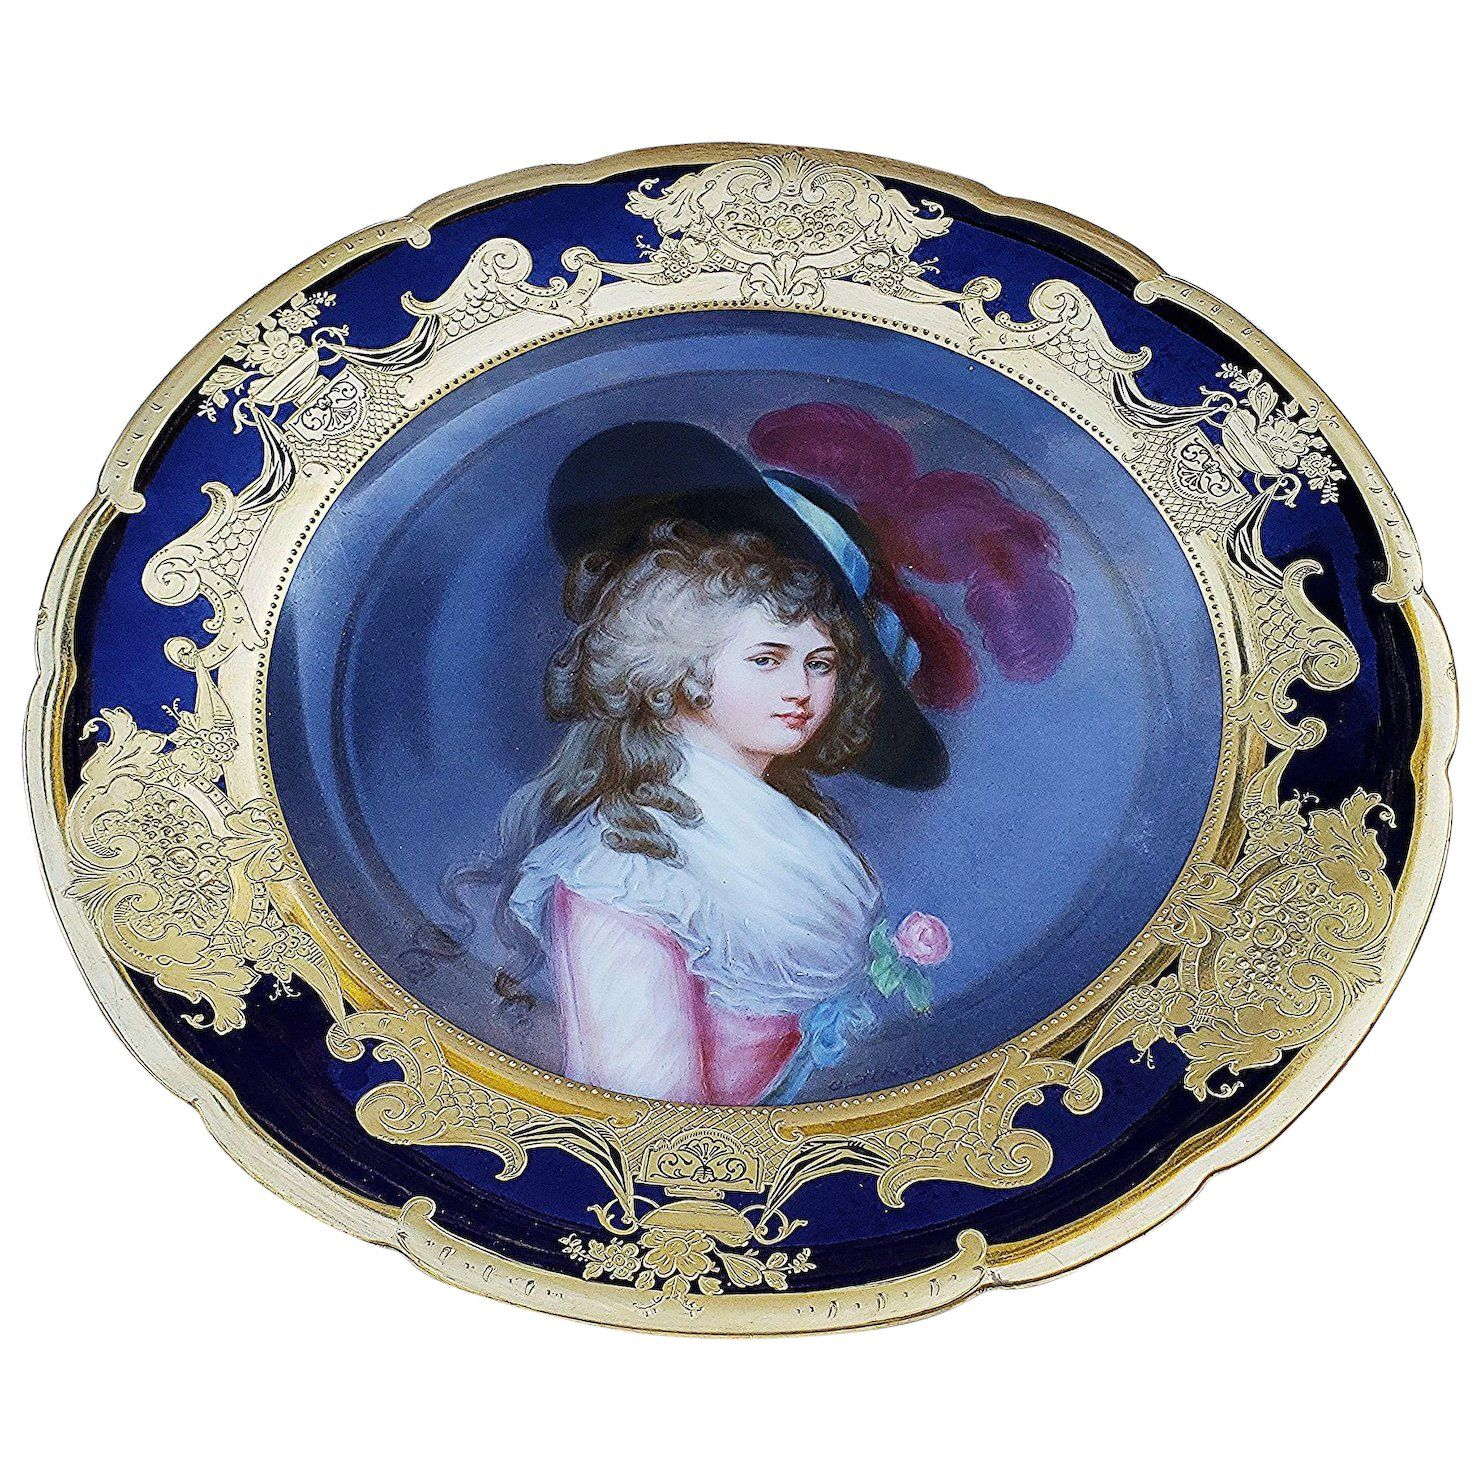 Lovely Lady Portrait Pitcher Lady Portrait Creamer Bavaria Portrait Plate Sweet Cream Pitcher Germany